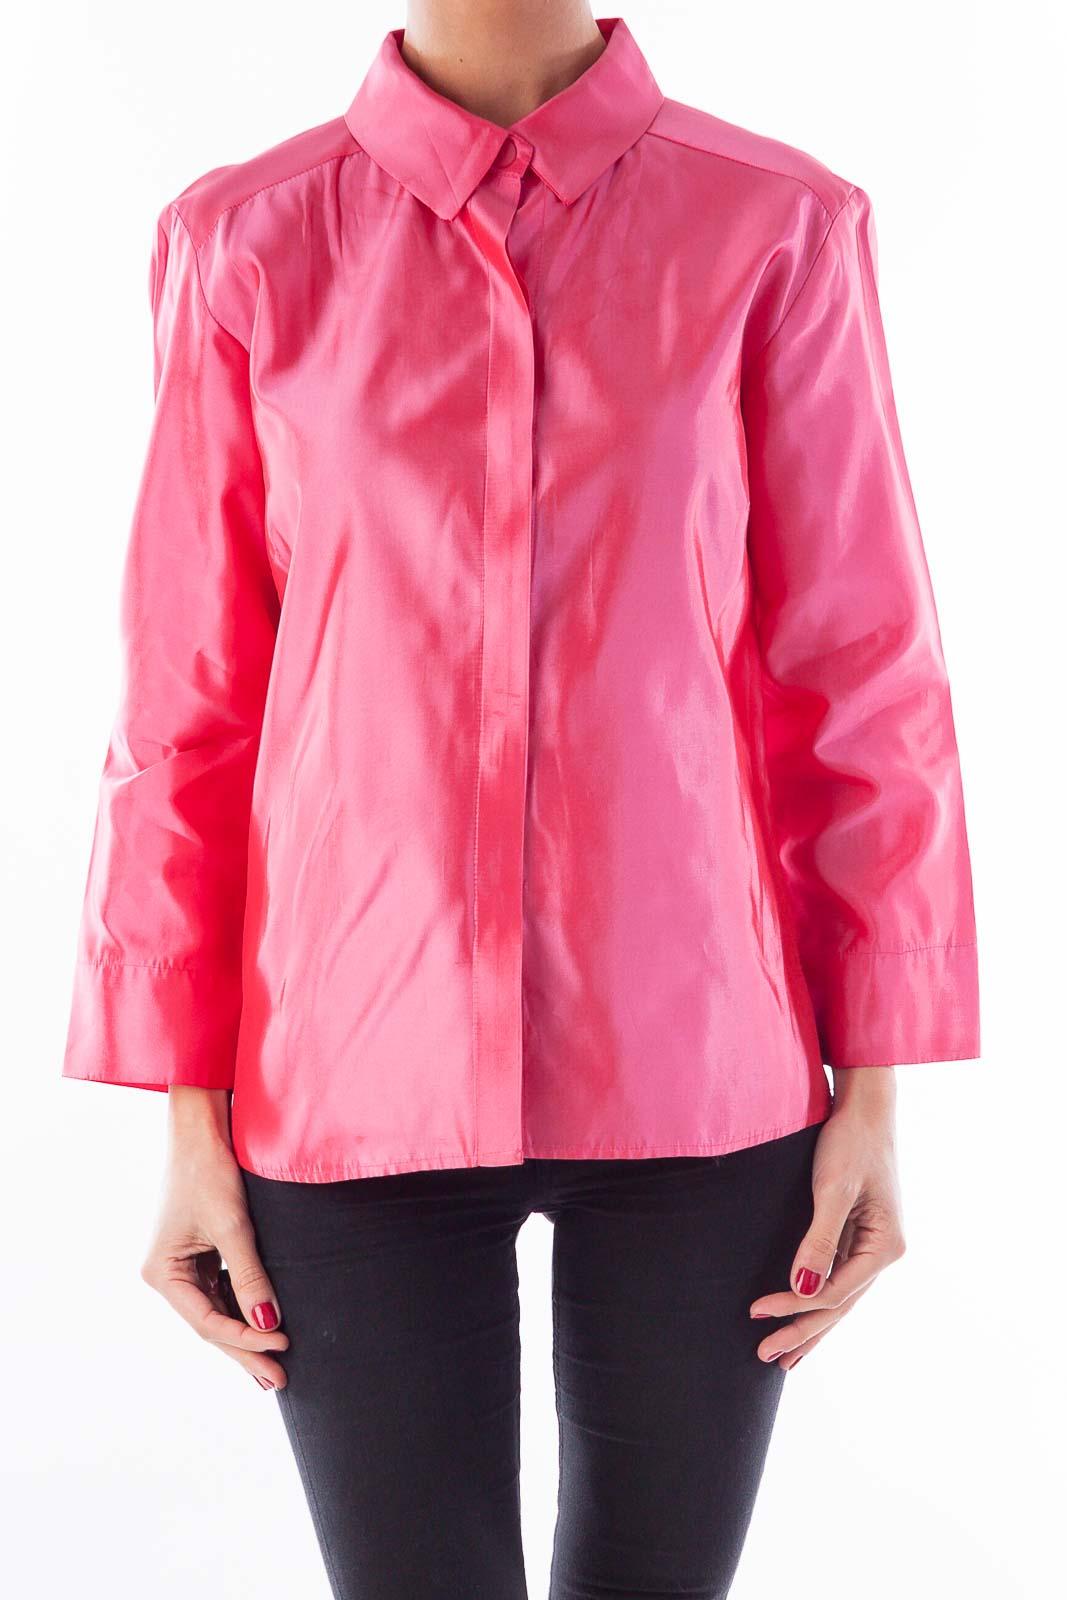 Pink Satin Button Shirt Front